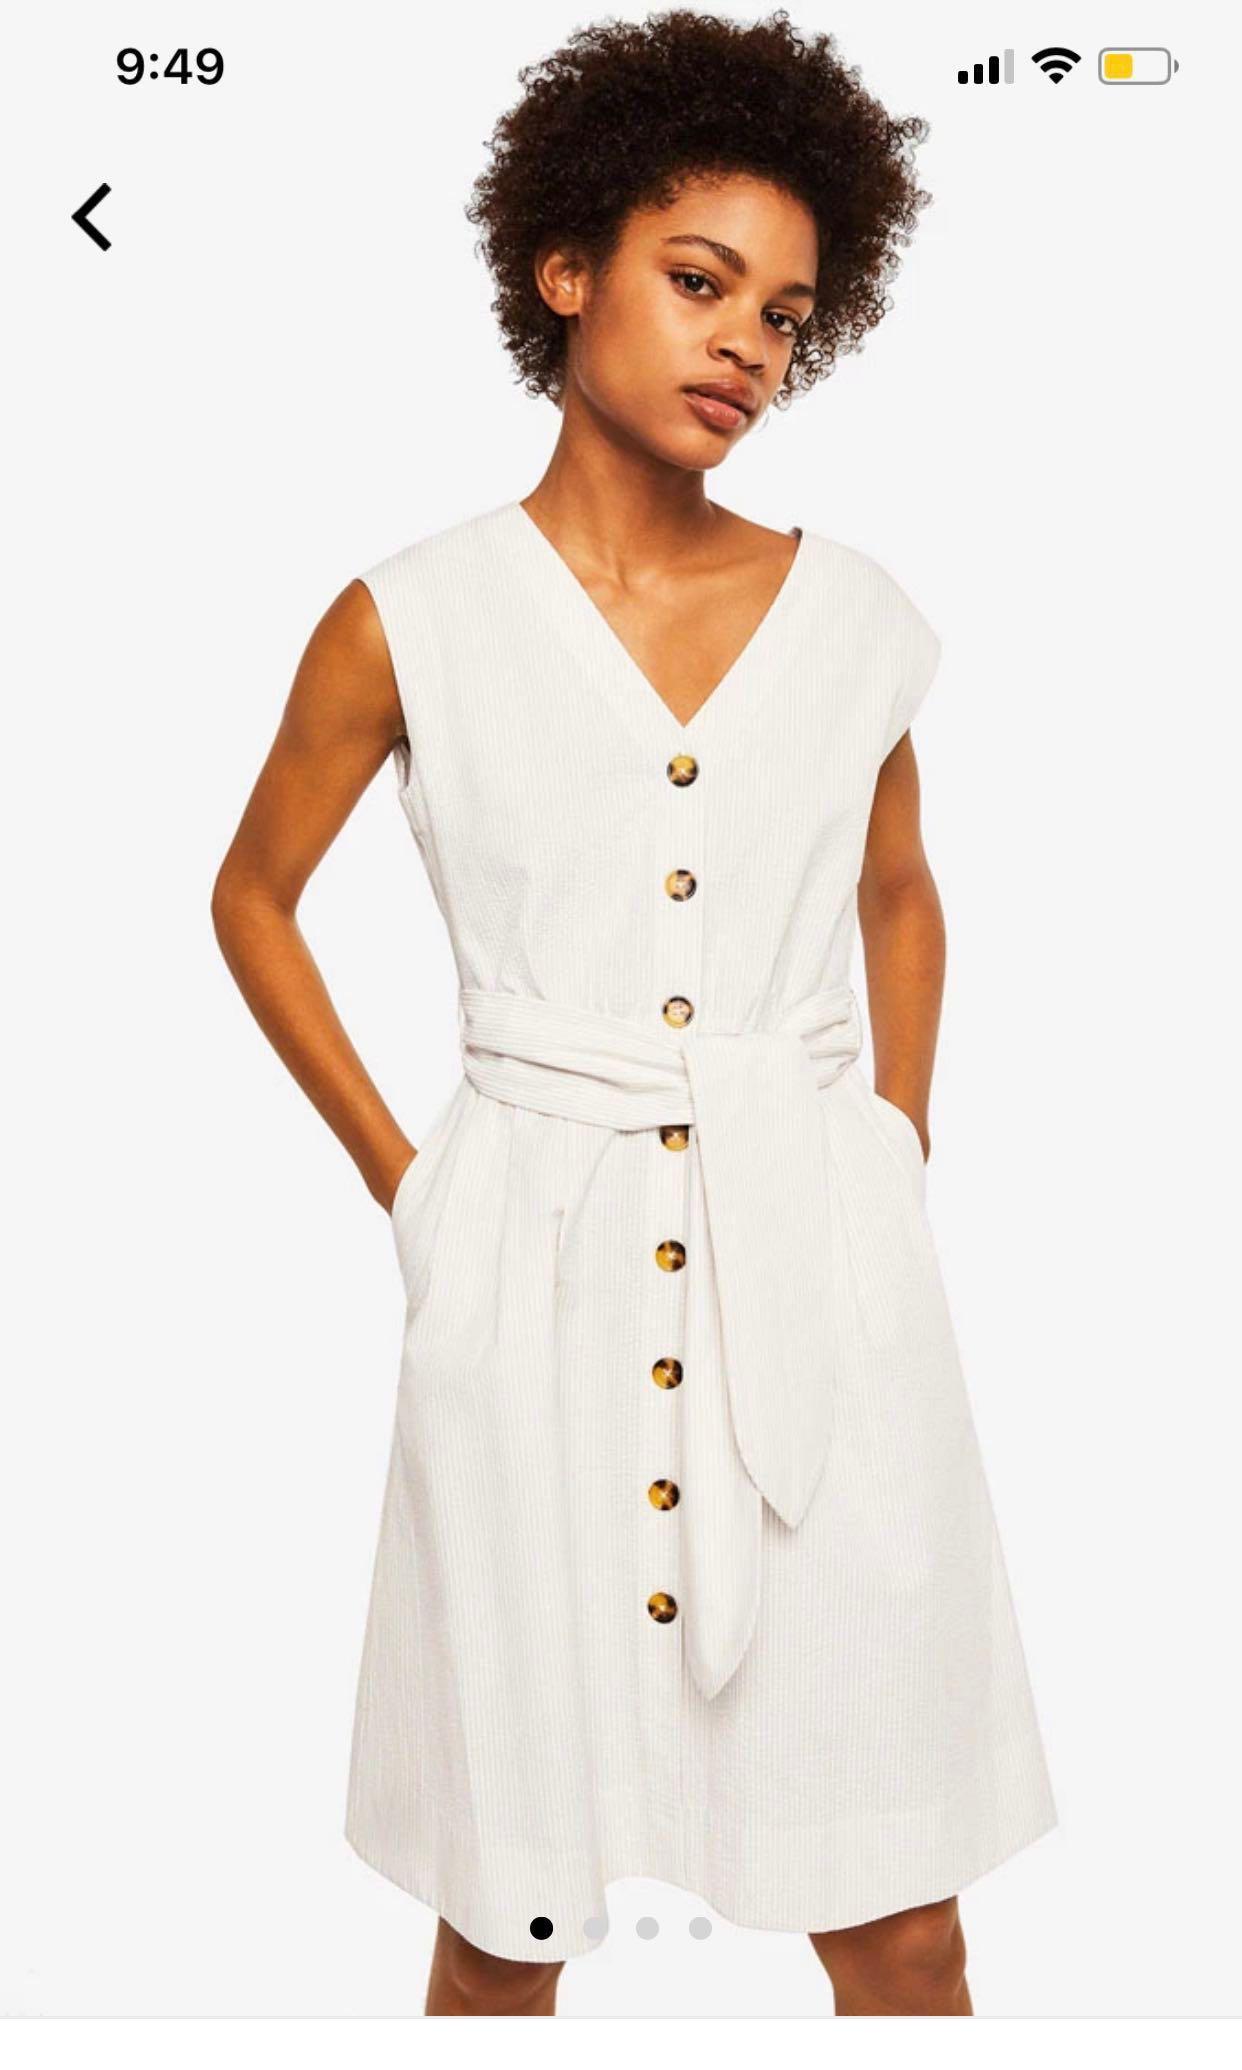 570fe5454d Mango Textured Bow Dress, Women's Fashion, Clothes, Dresses & Skirts ...